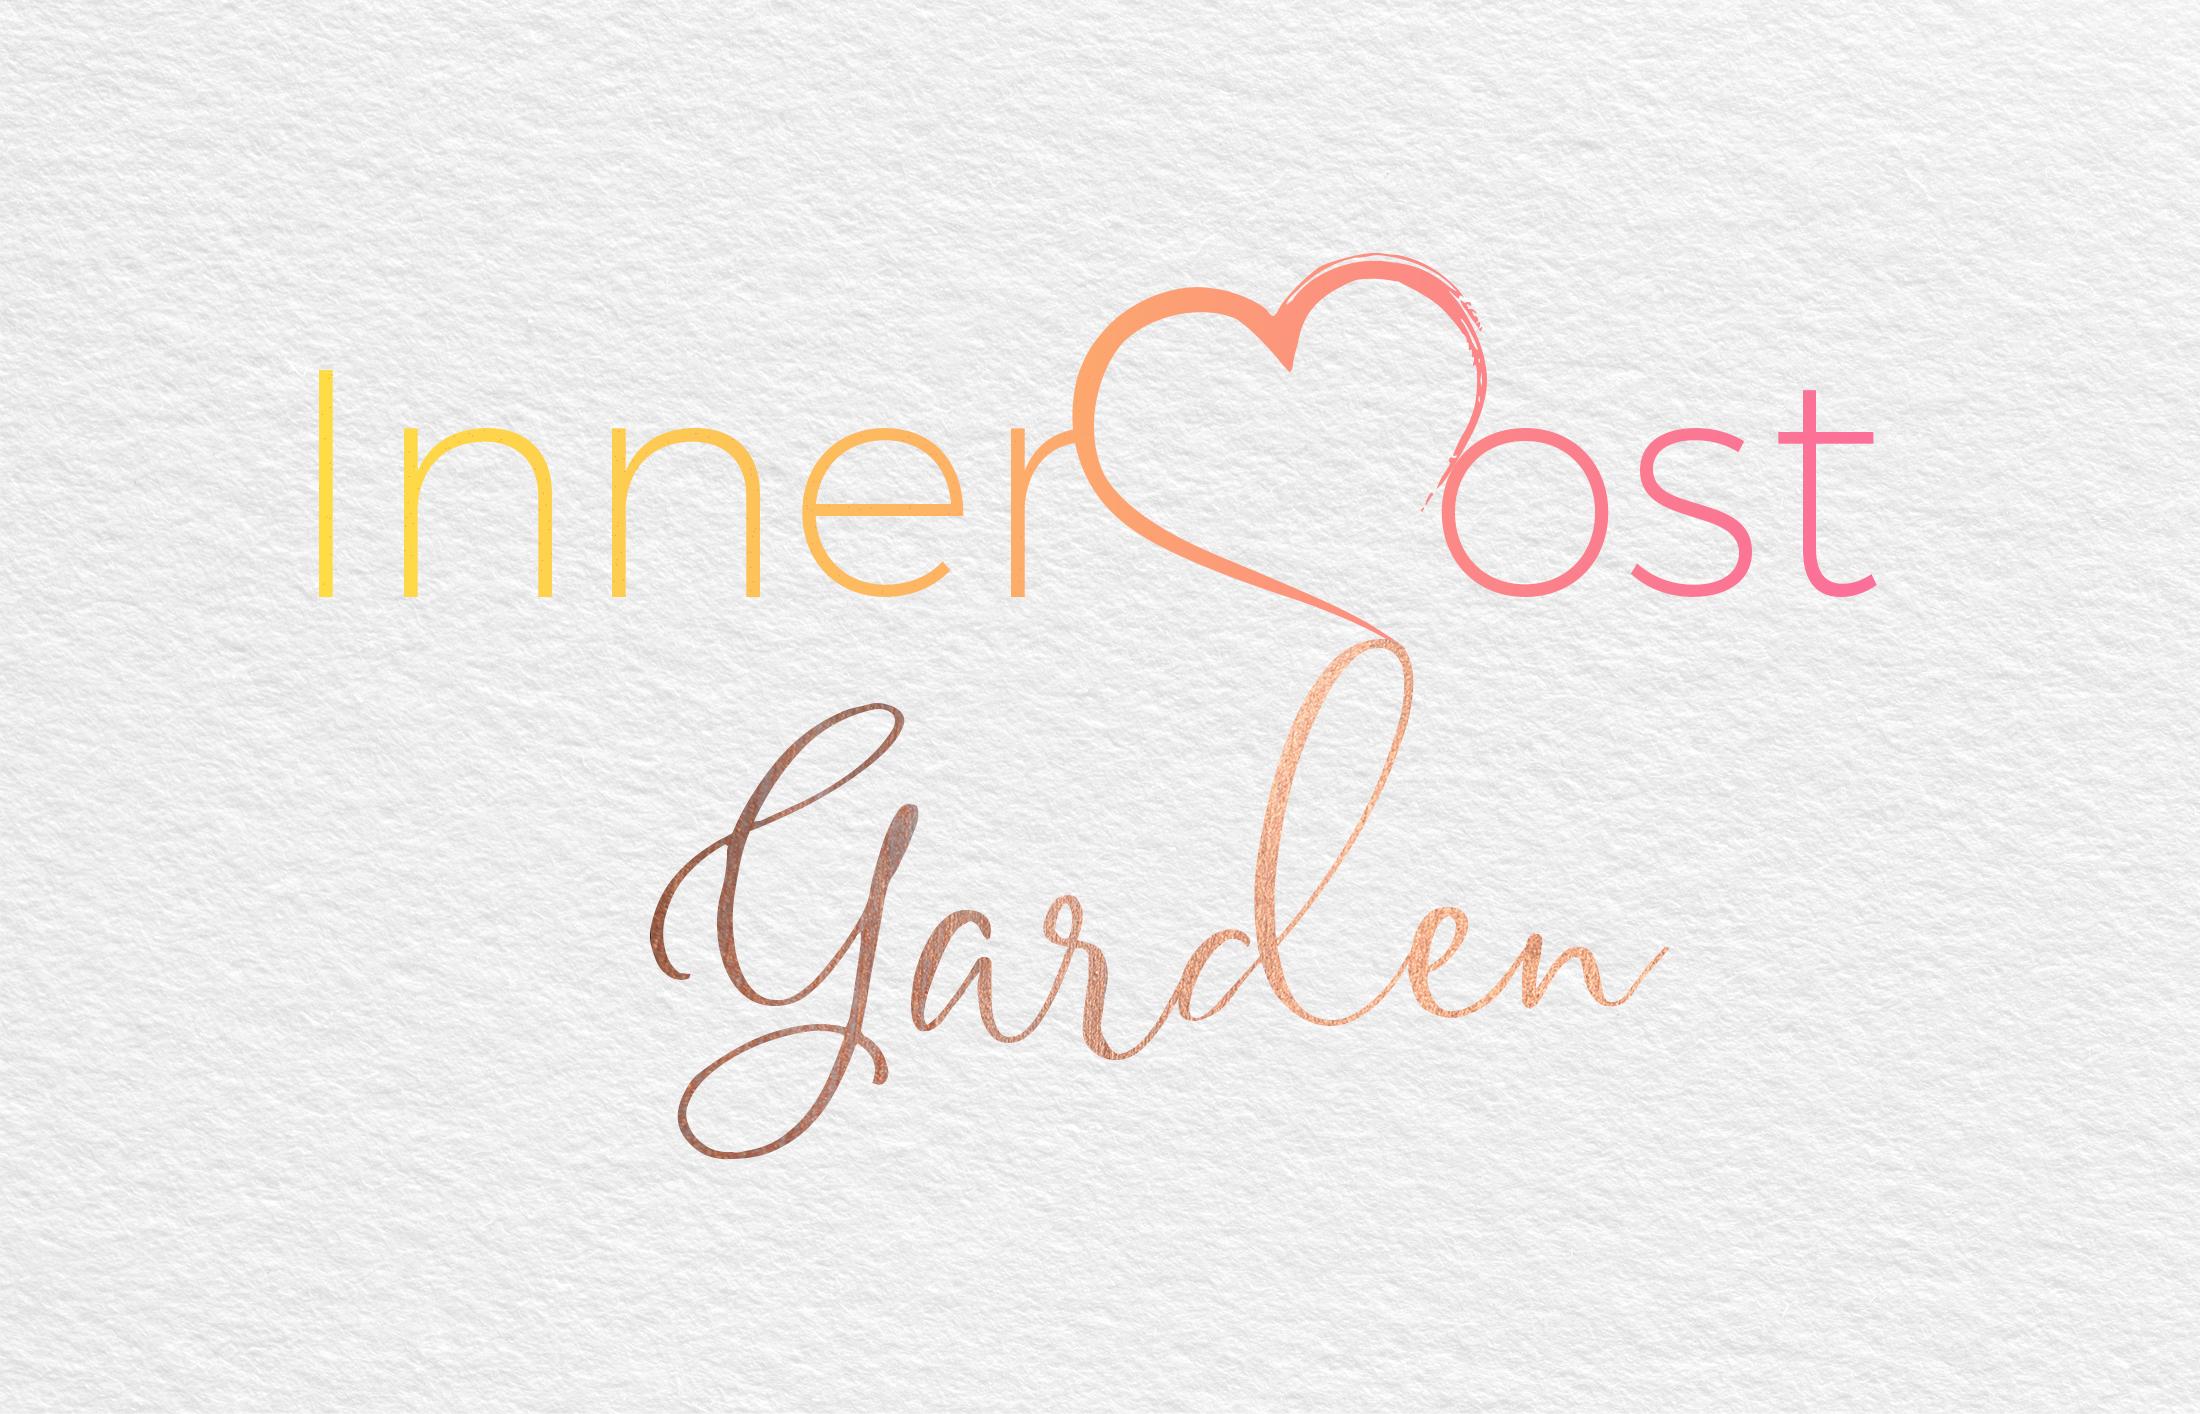 Logo Innermost garden coloré sur fond blanc effet papier (brandidng).